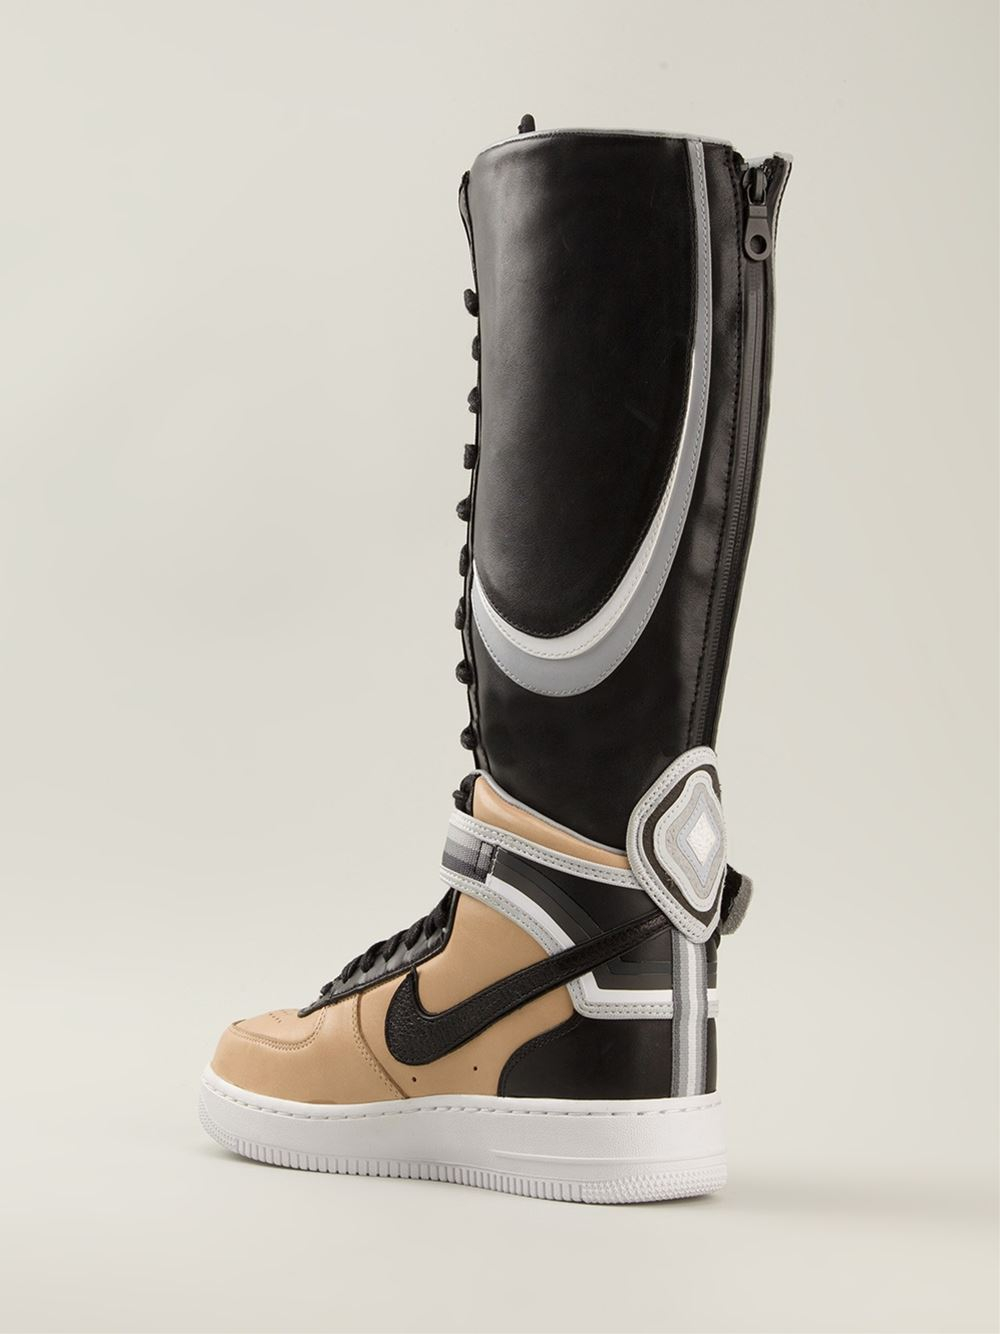 women's air force 1 upstep warrior shoe